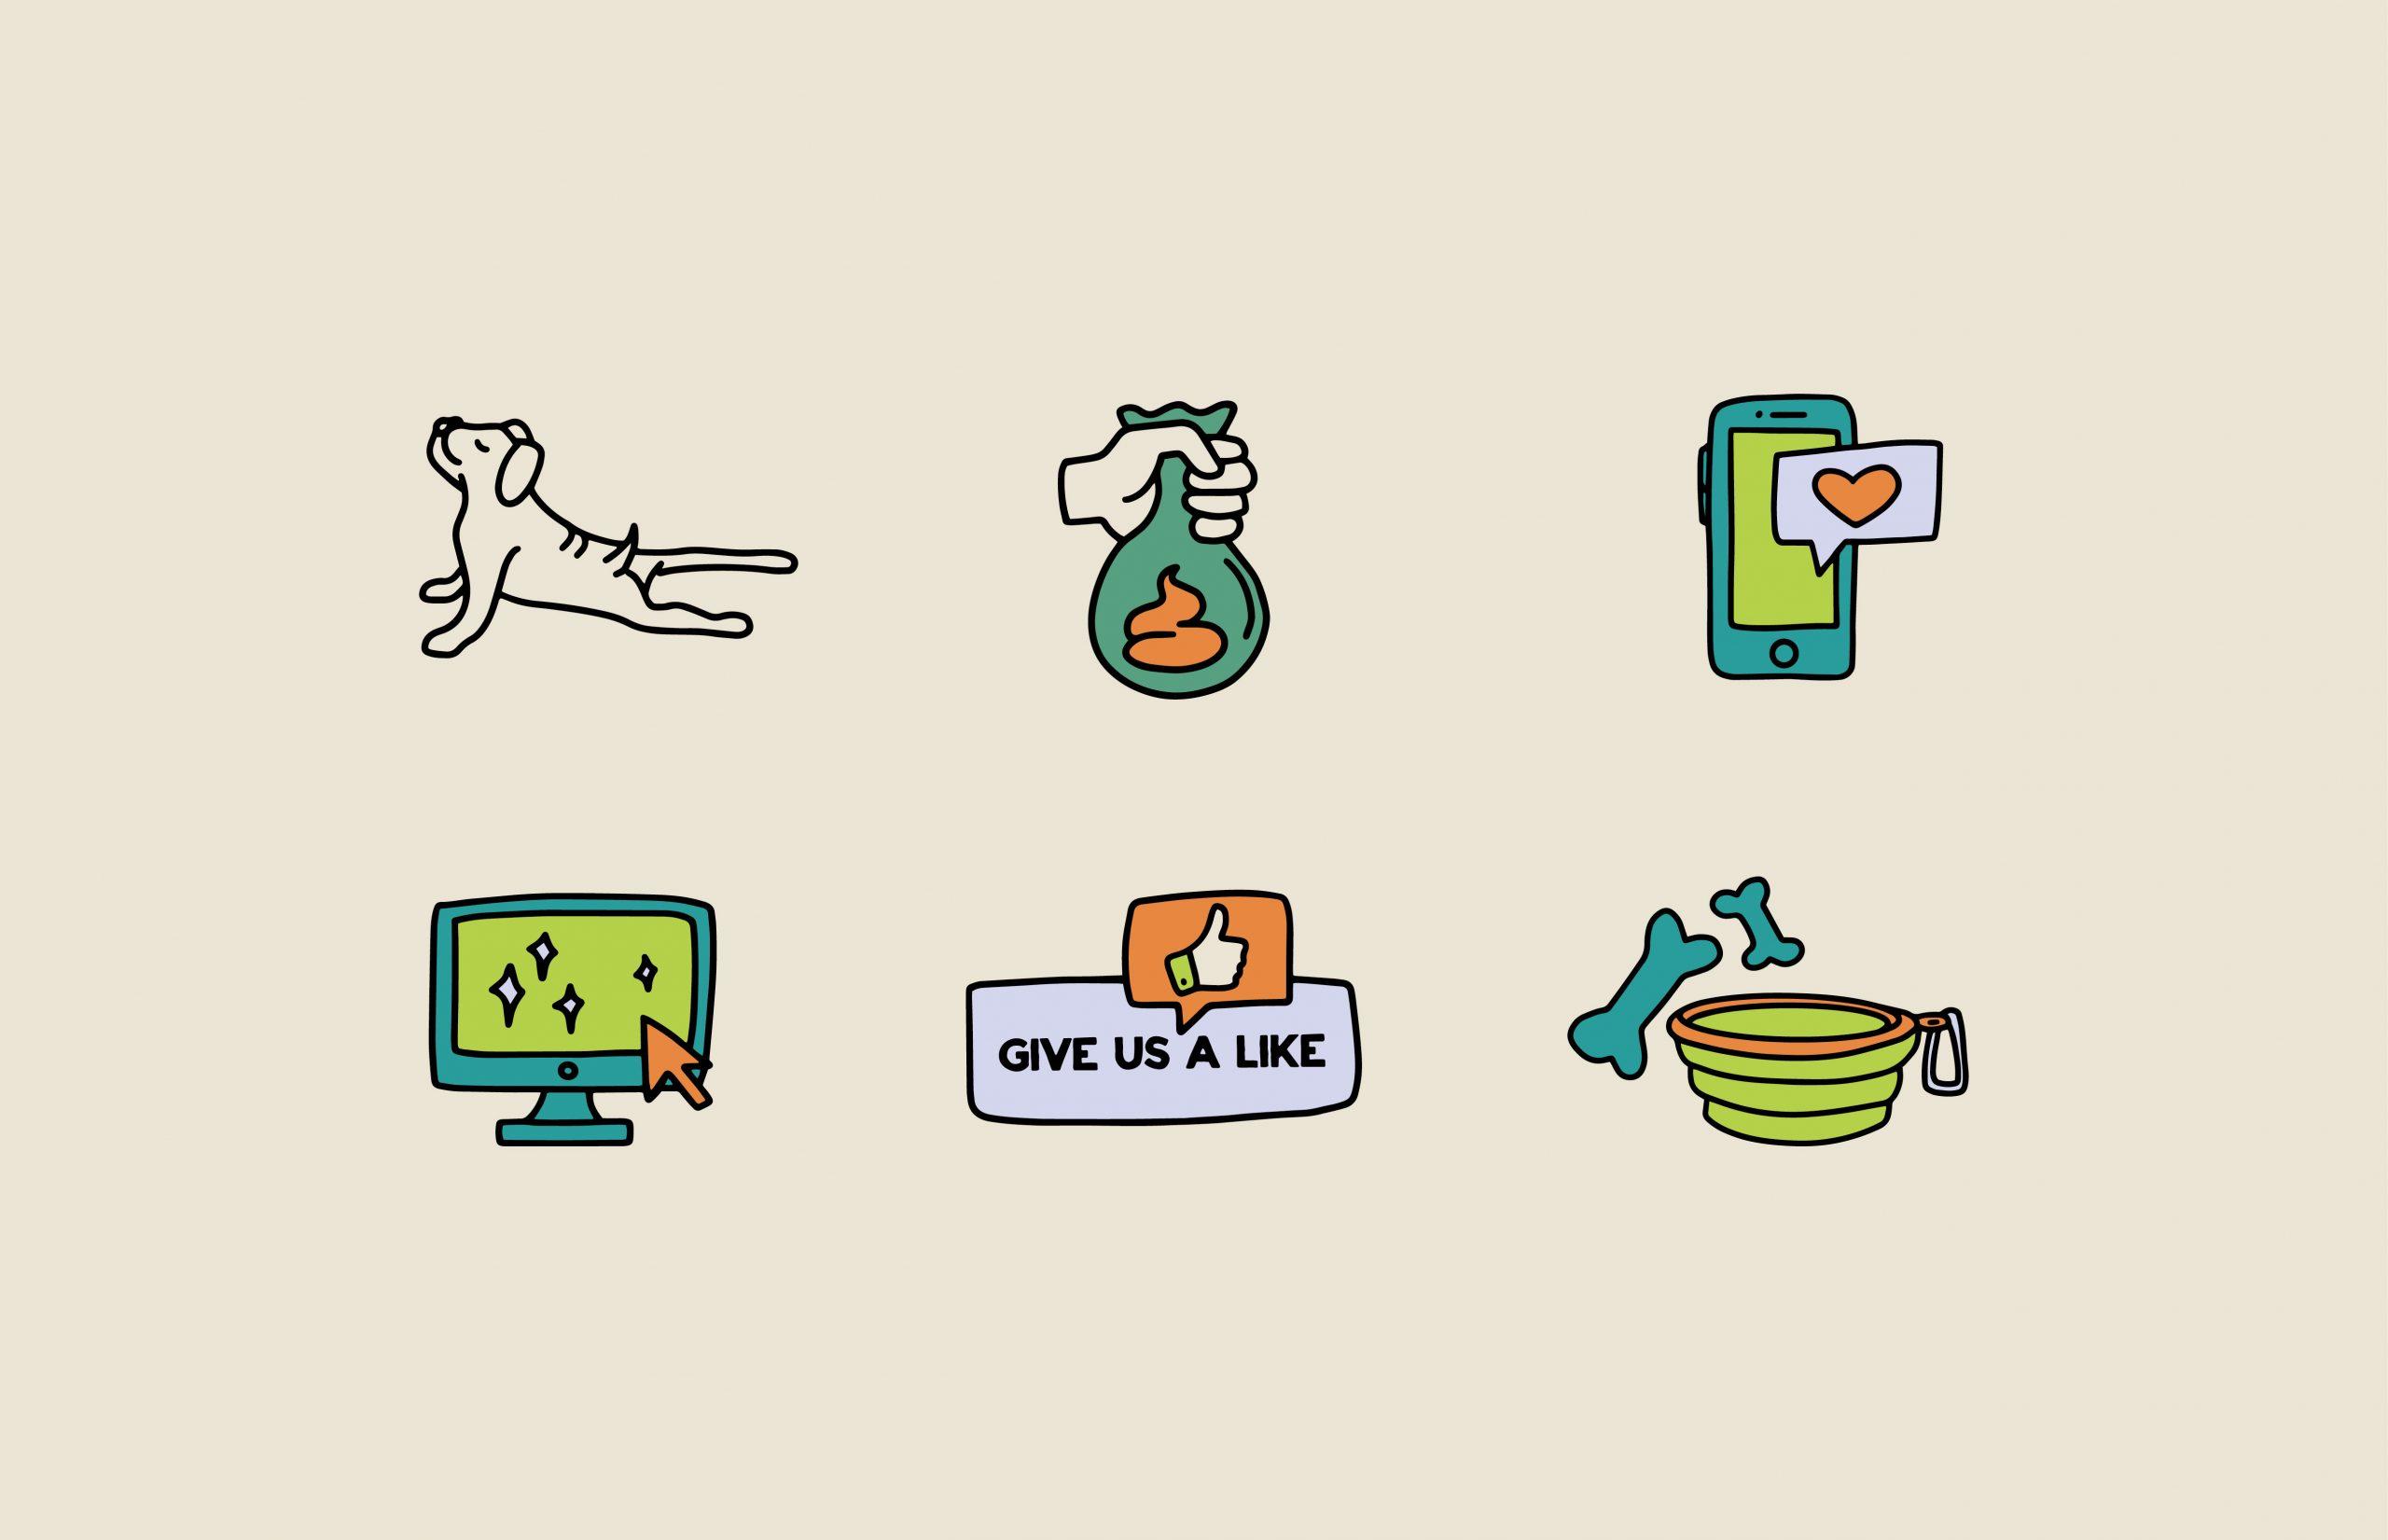 dog icon, bag icon, phone icon, computer icon, social media icon, dog bone icon